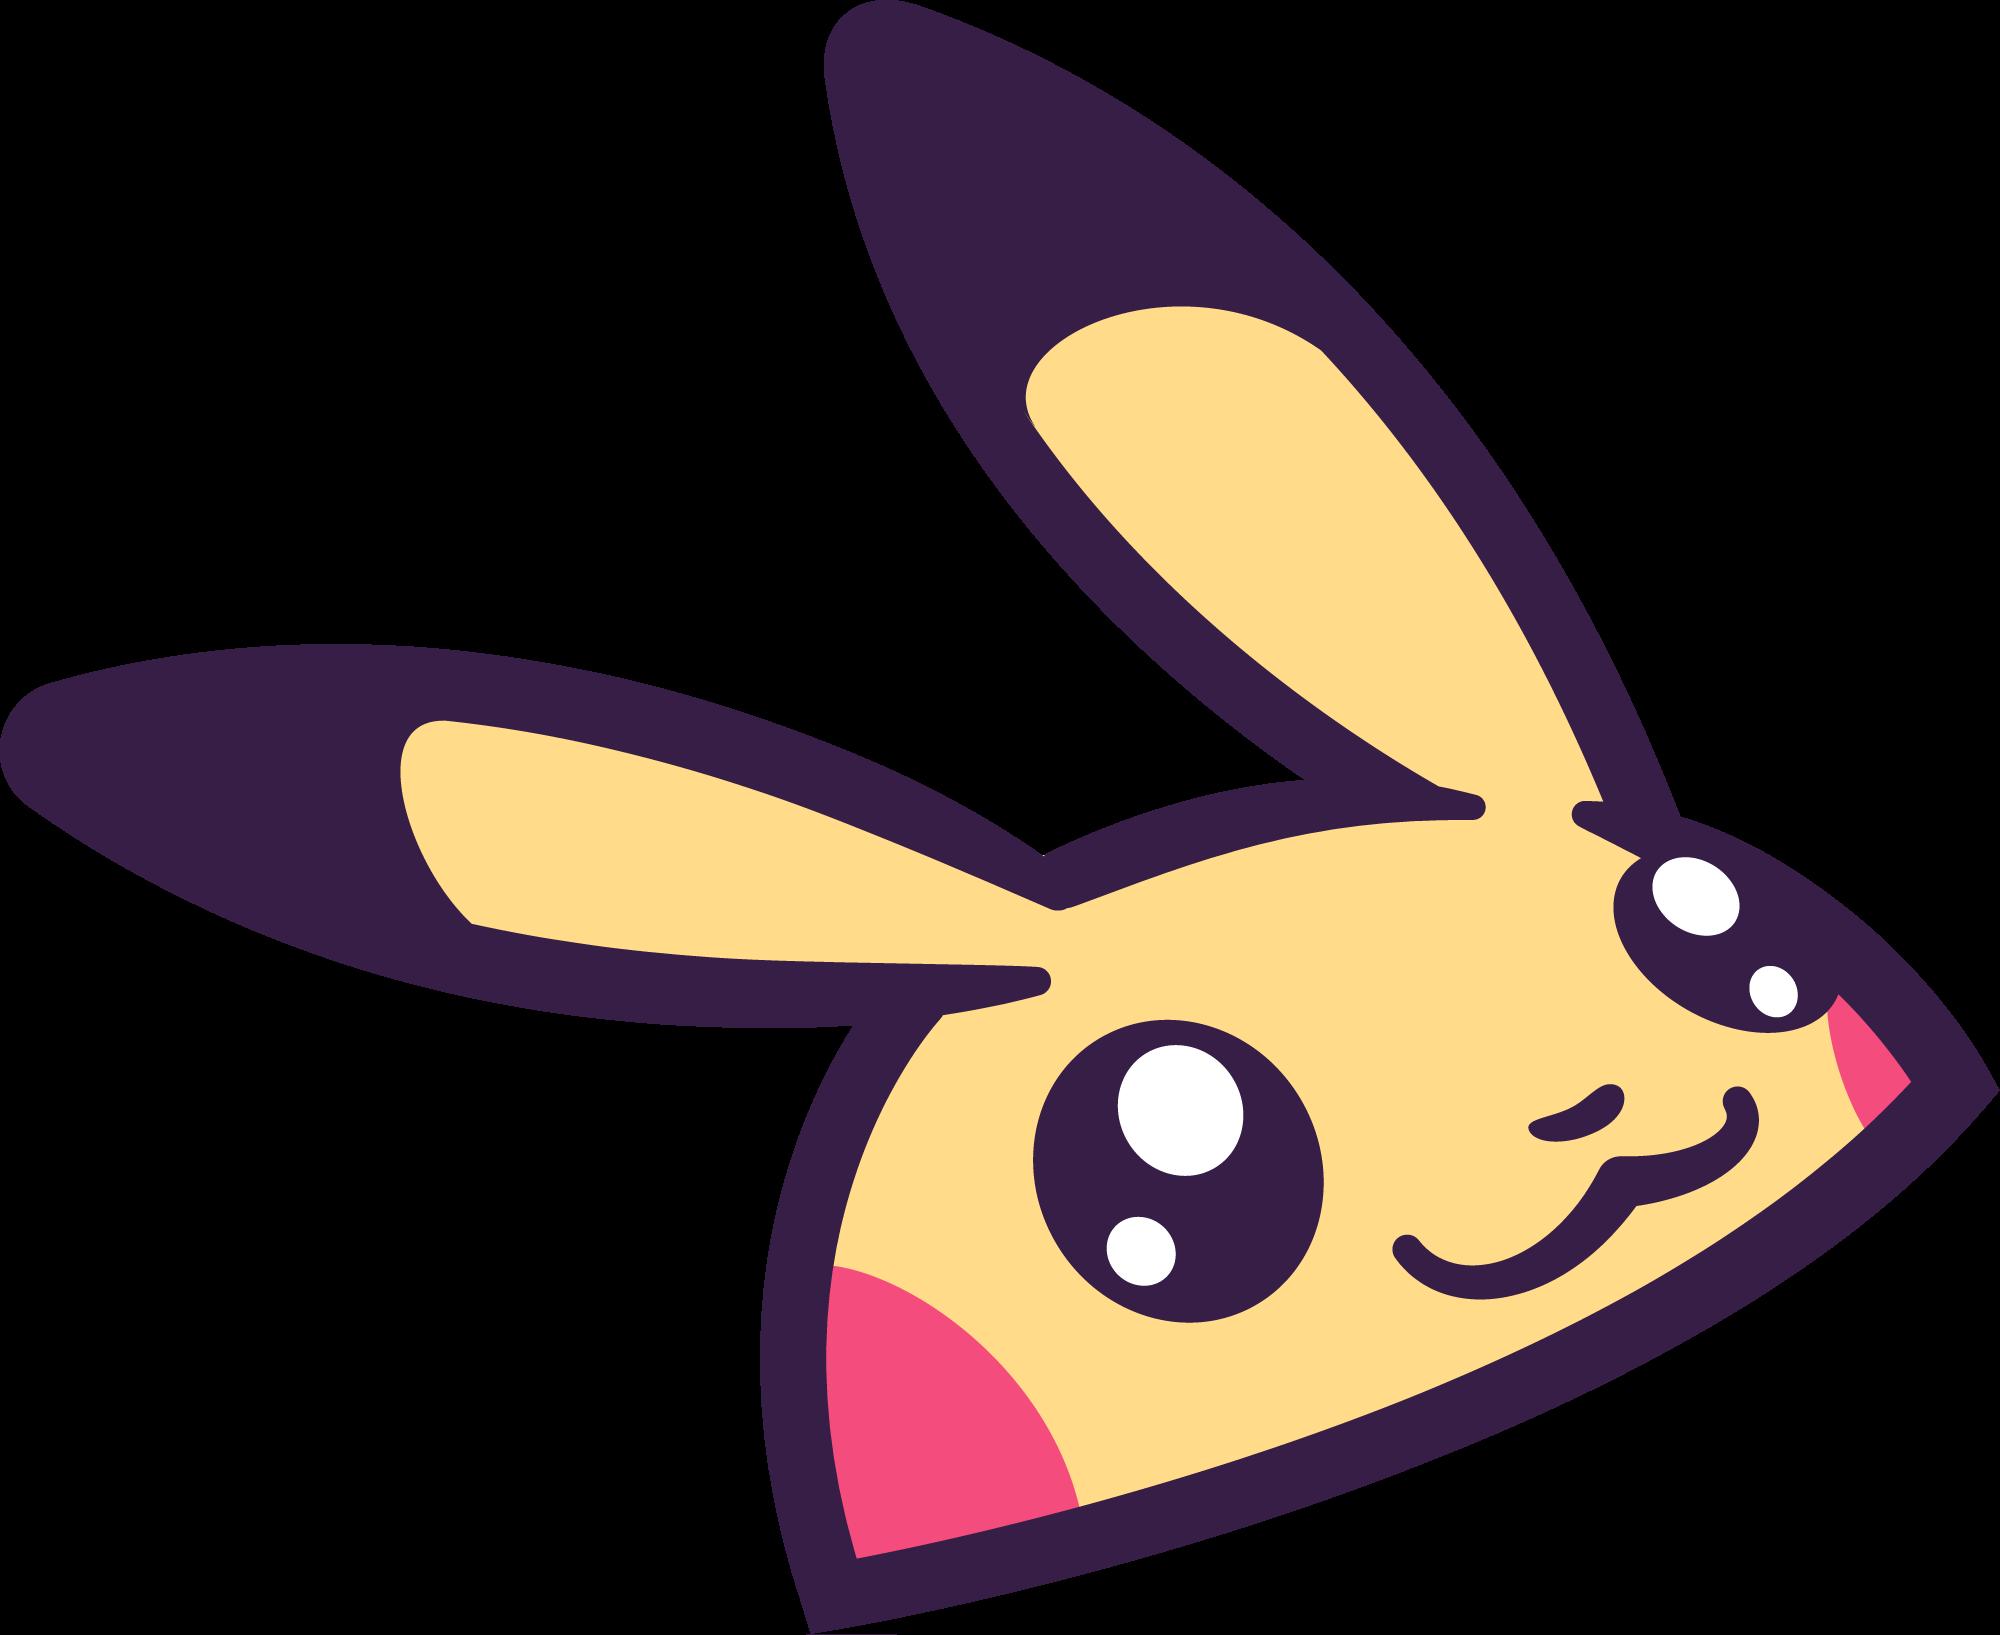 Dribbble pikachu hat png. King clipart cap